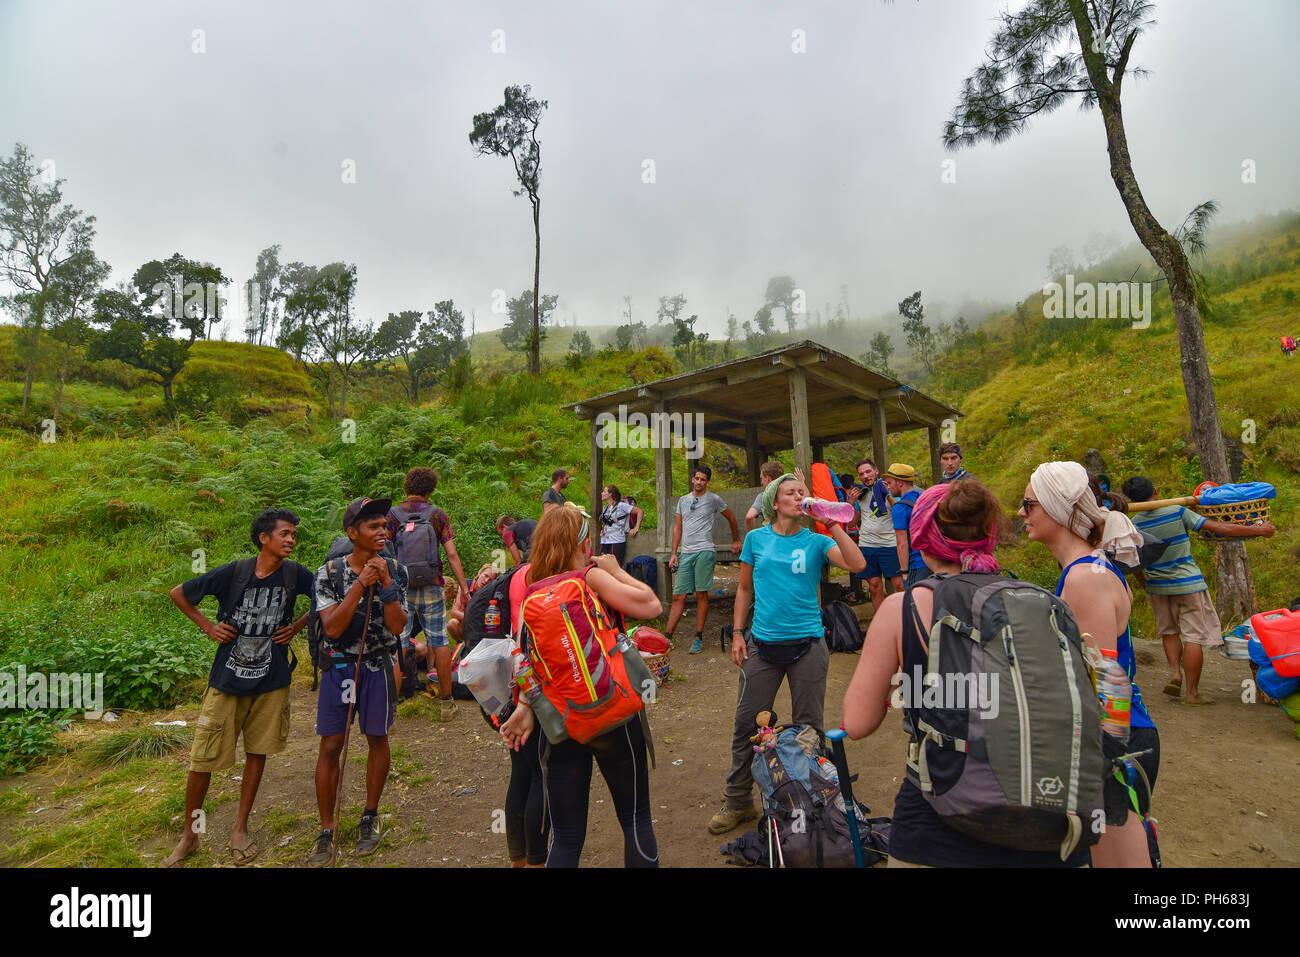 Hiking and Trekking at Mount Rinjani, Lombok, Indonesia - Stock Image